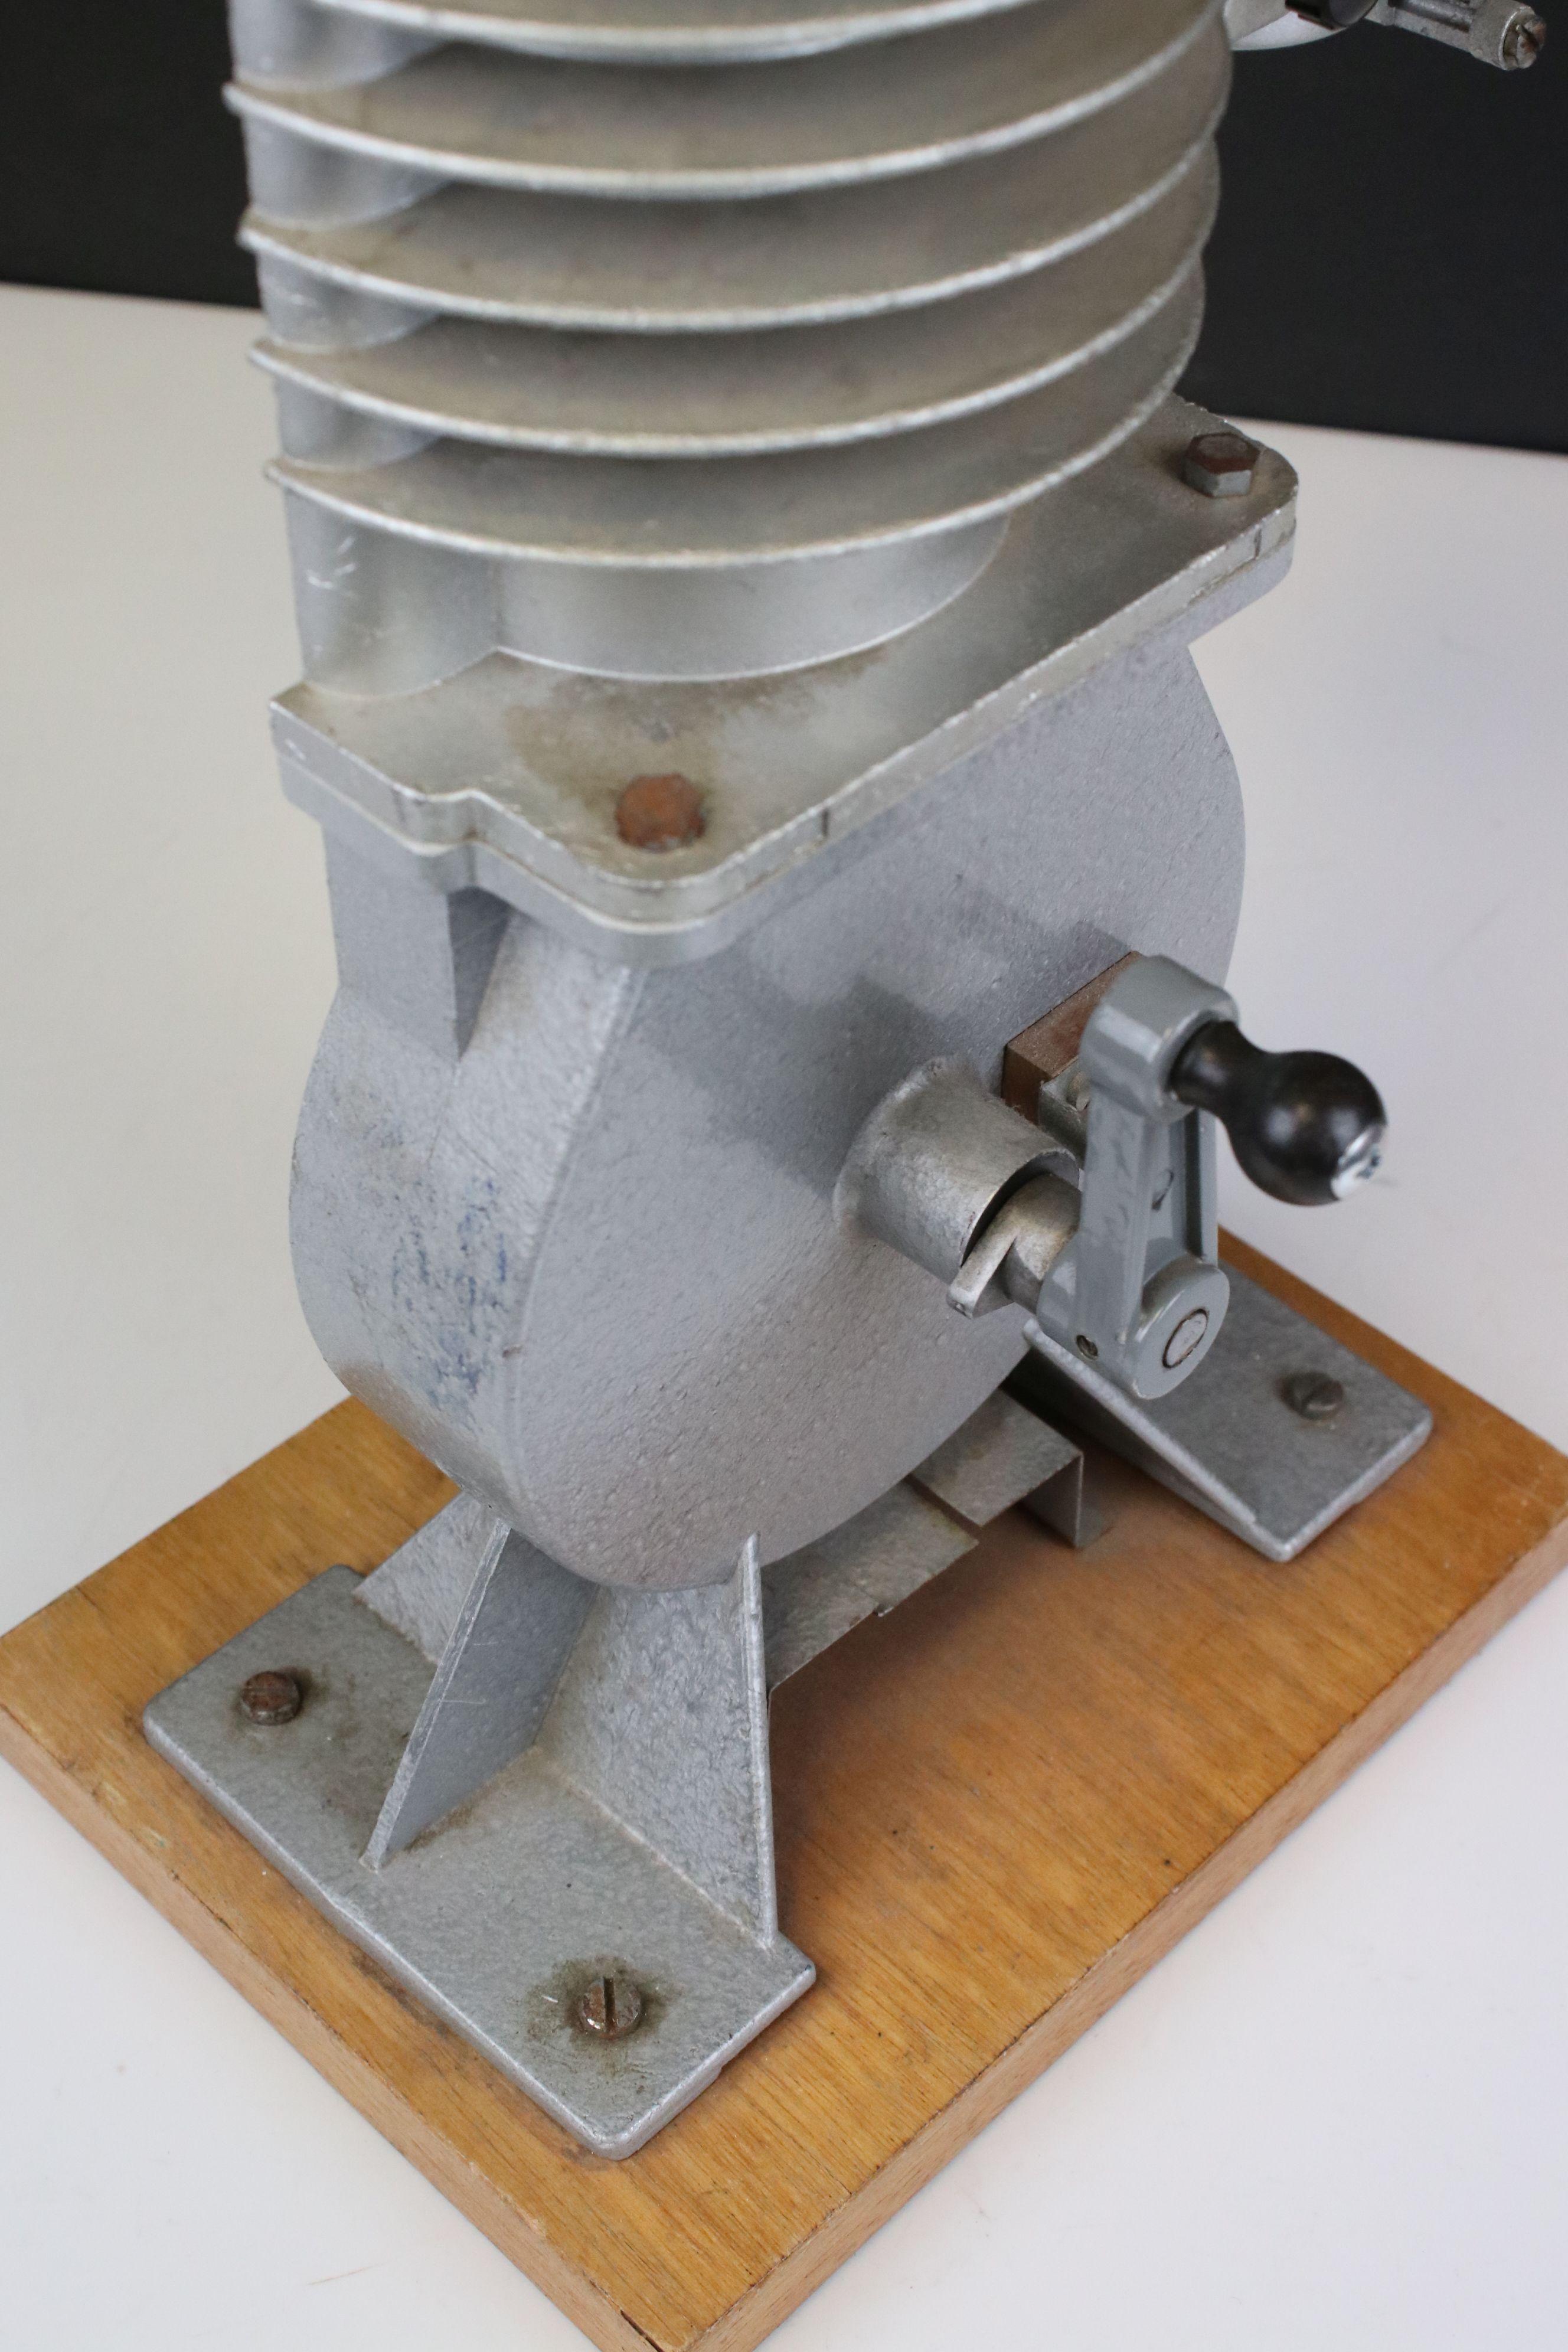 Cast Cut-away Demonstration Model of a Two-stroke Engine by Irwin & Partners Ltd of Croydon, on - Image 5 of 5